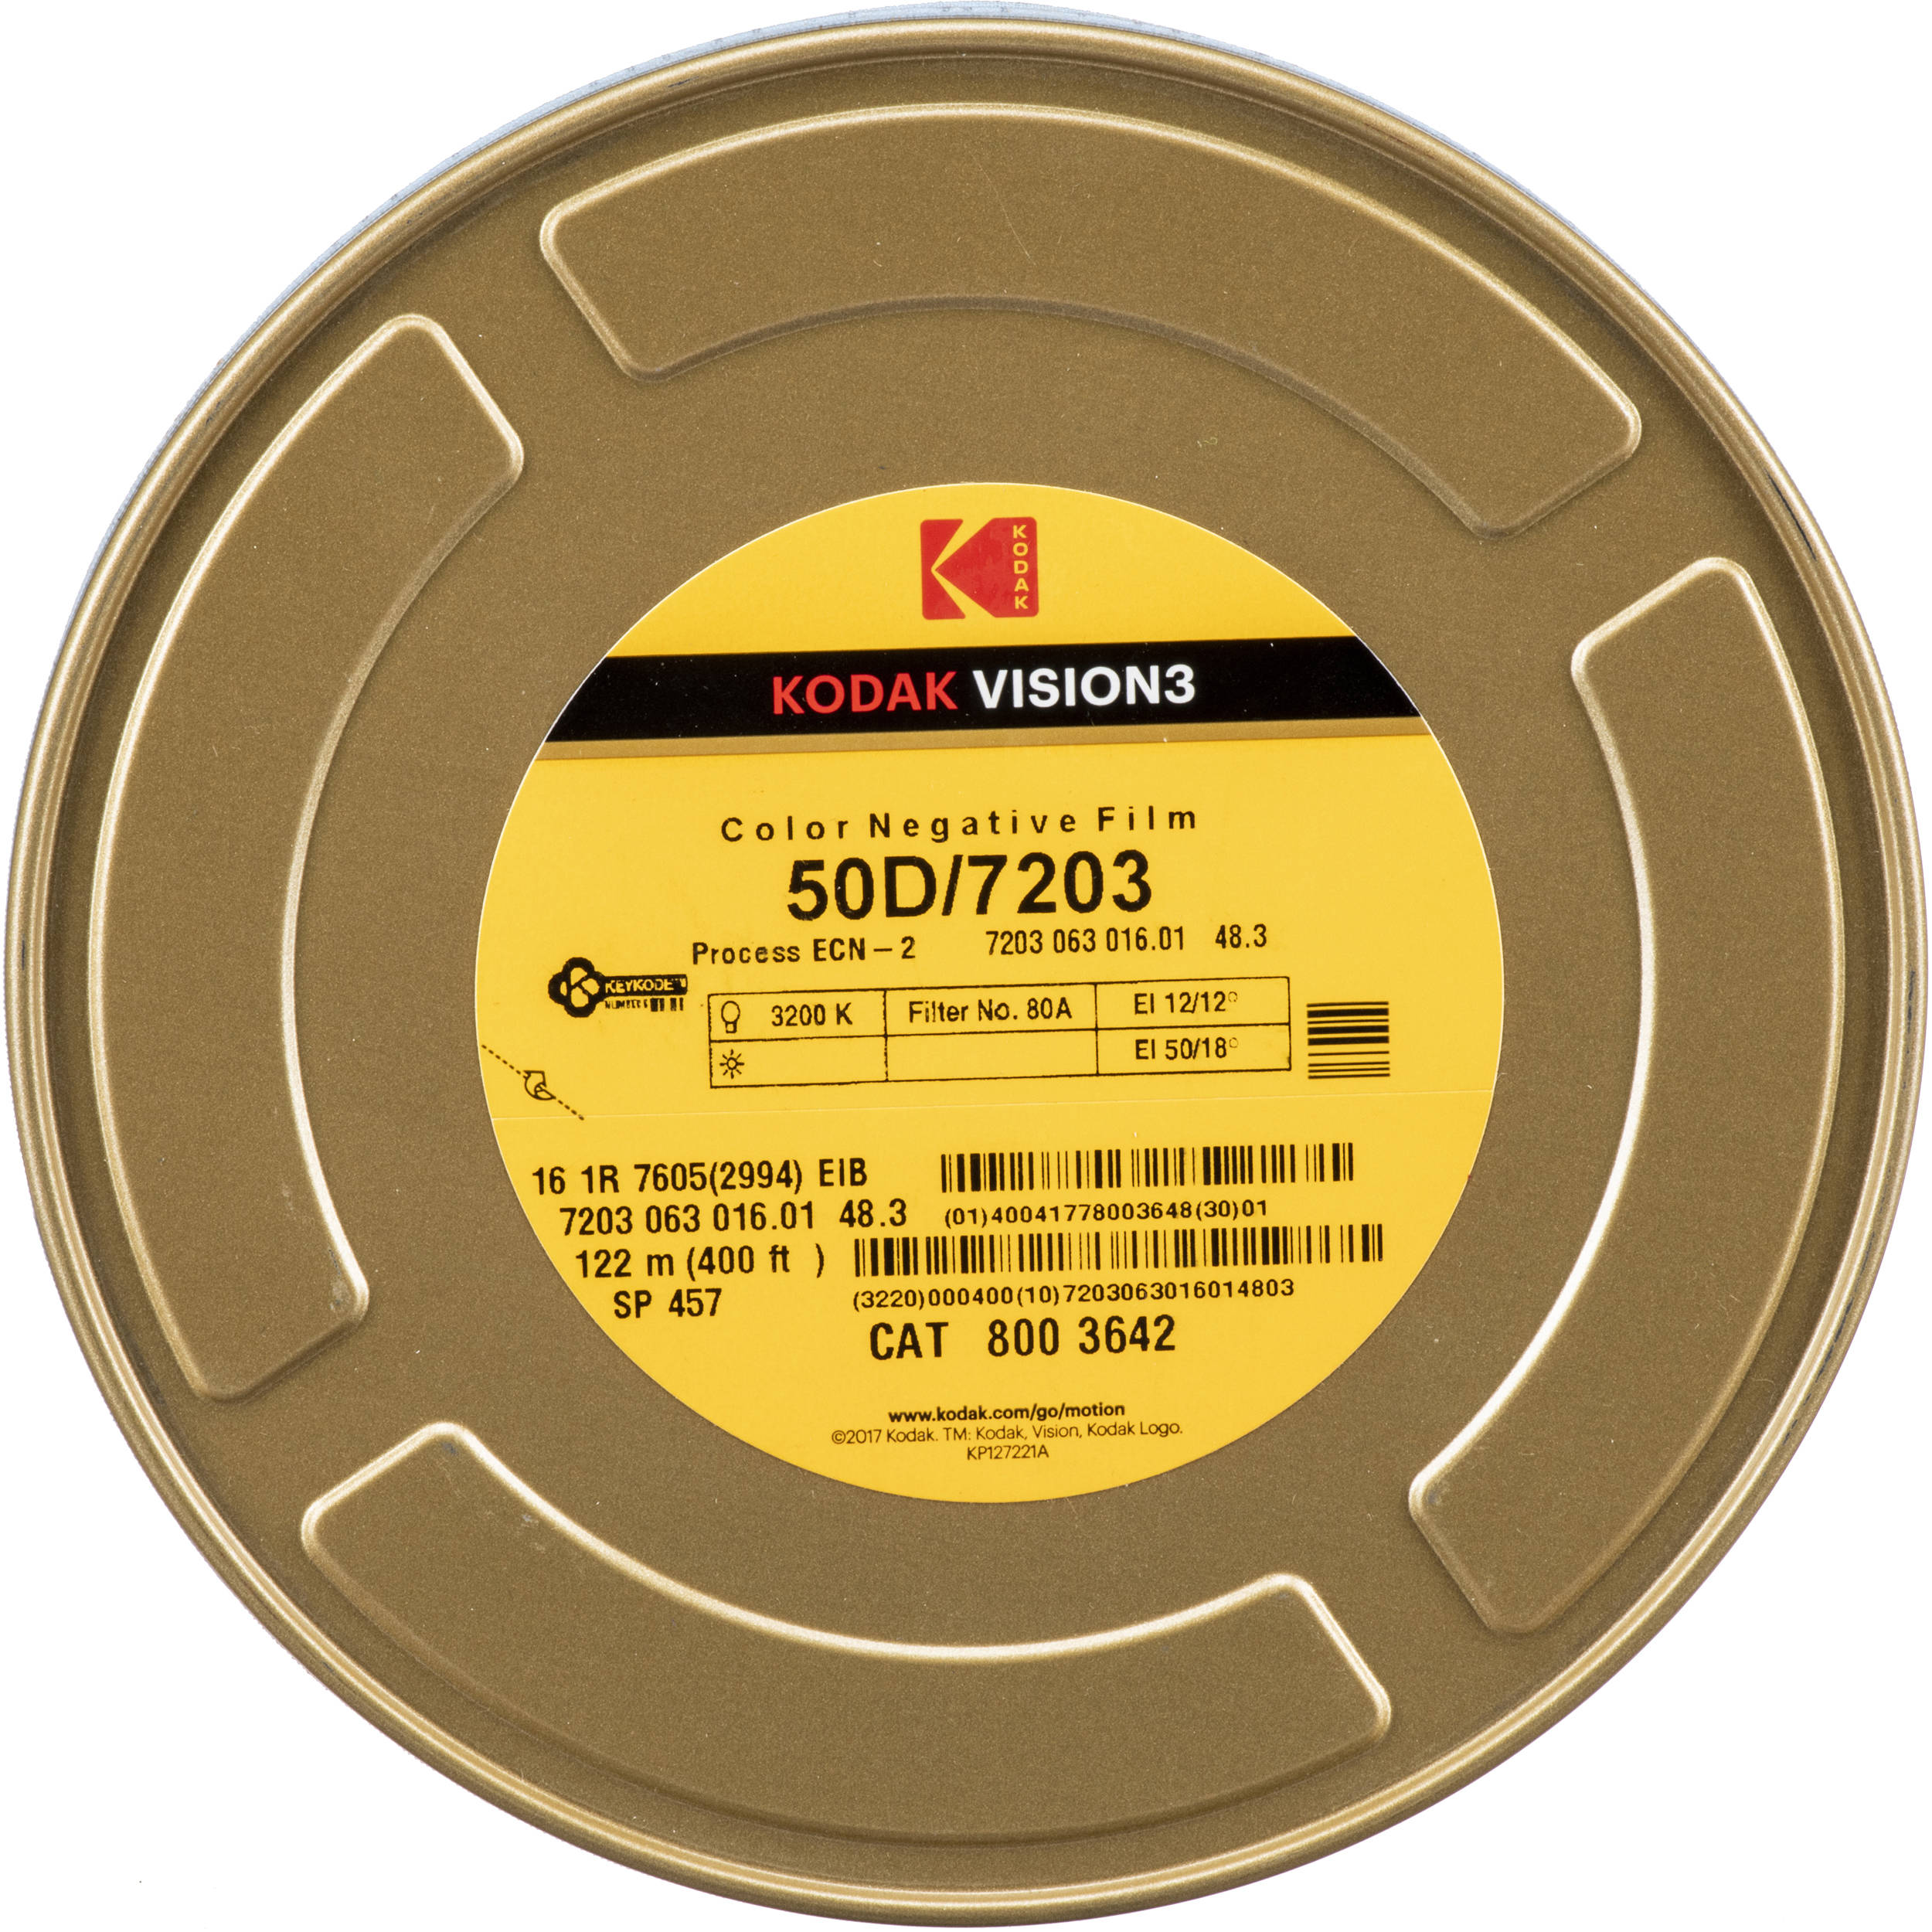 Kodak Vision3 50d Color Negative Film 7203 16mm 400 Roll